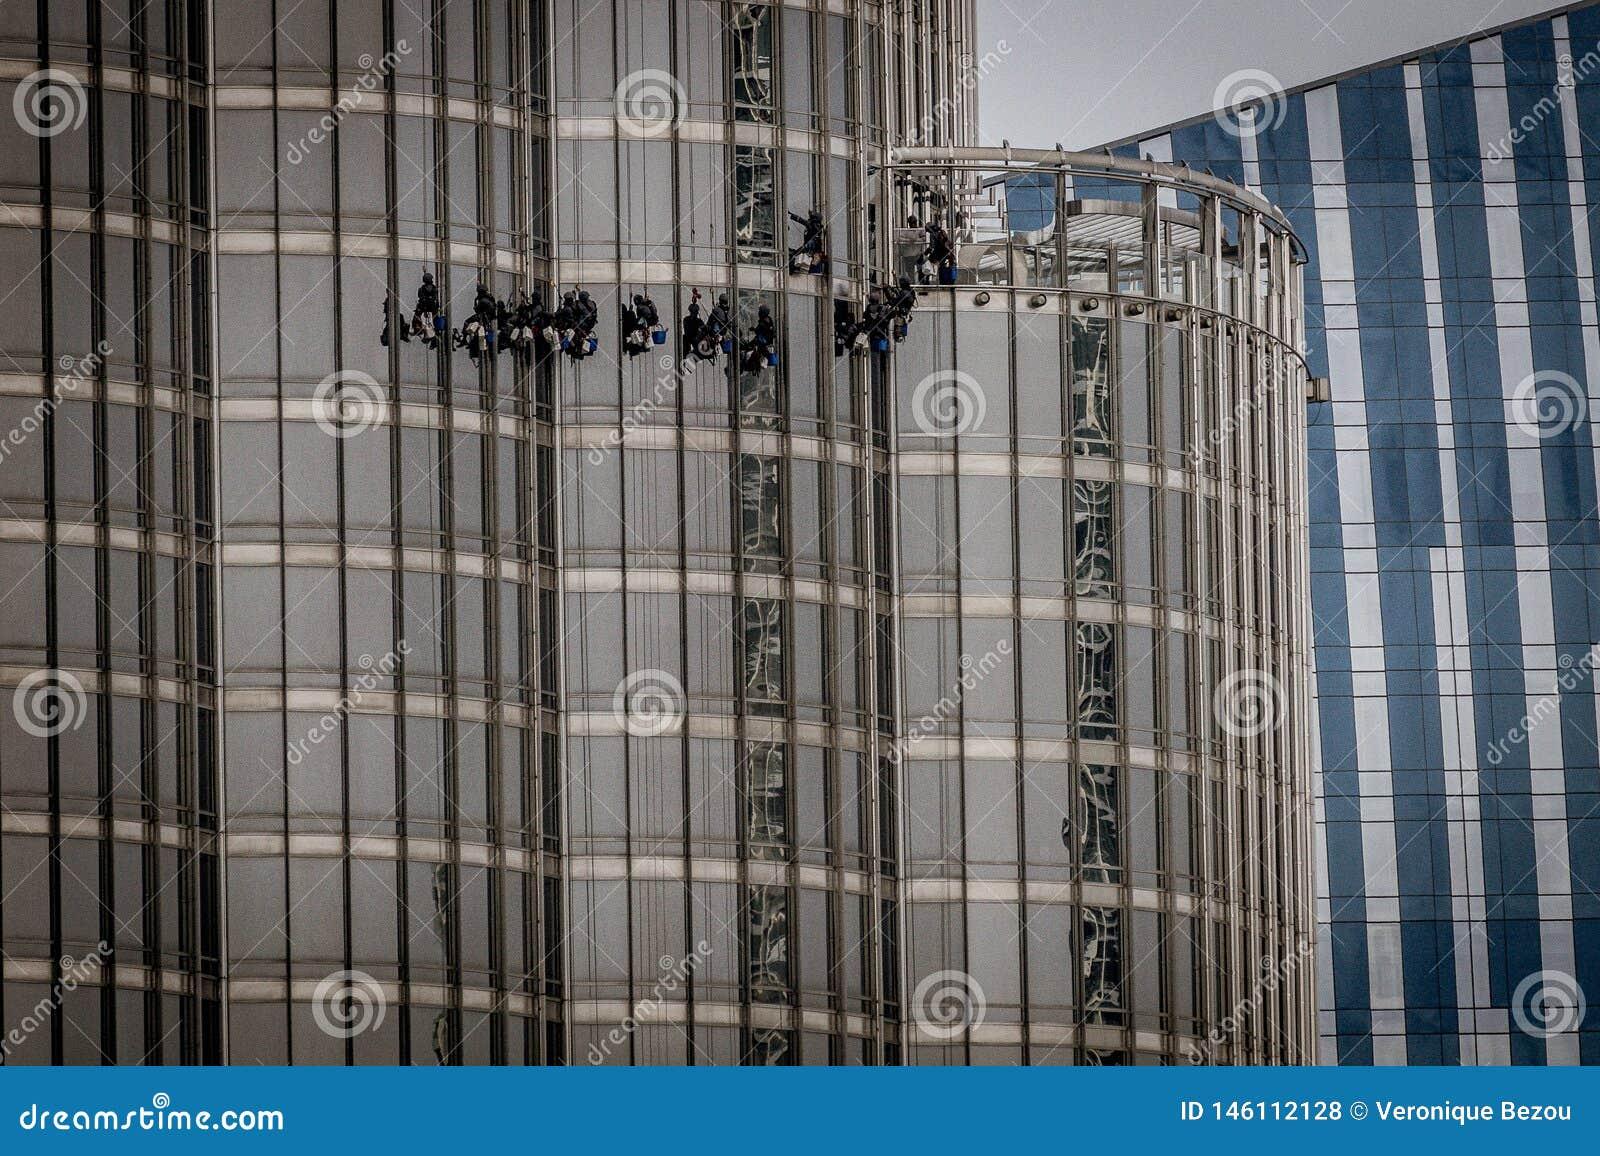 Dubai, UAE - April 28th, 2019: Cleaning windows at Burj Khalifa